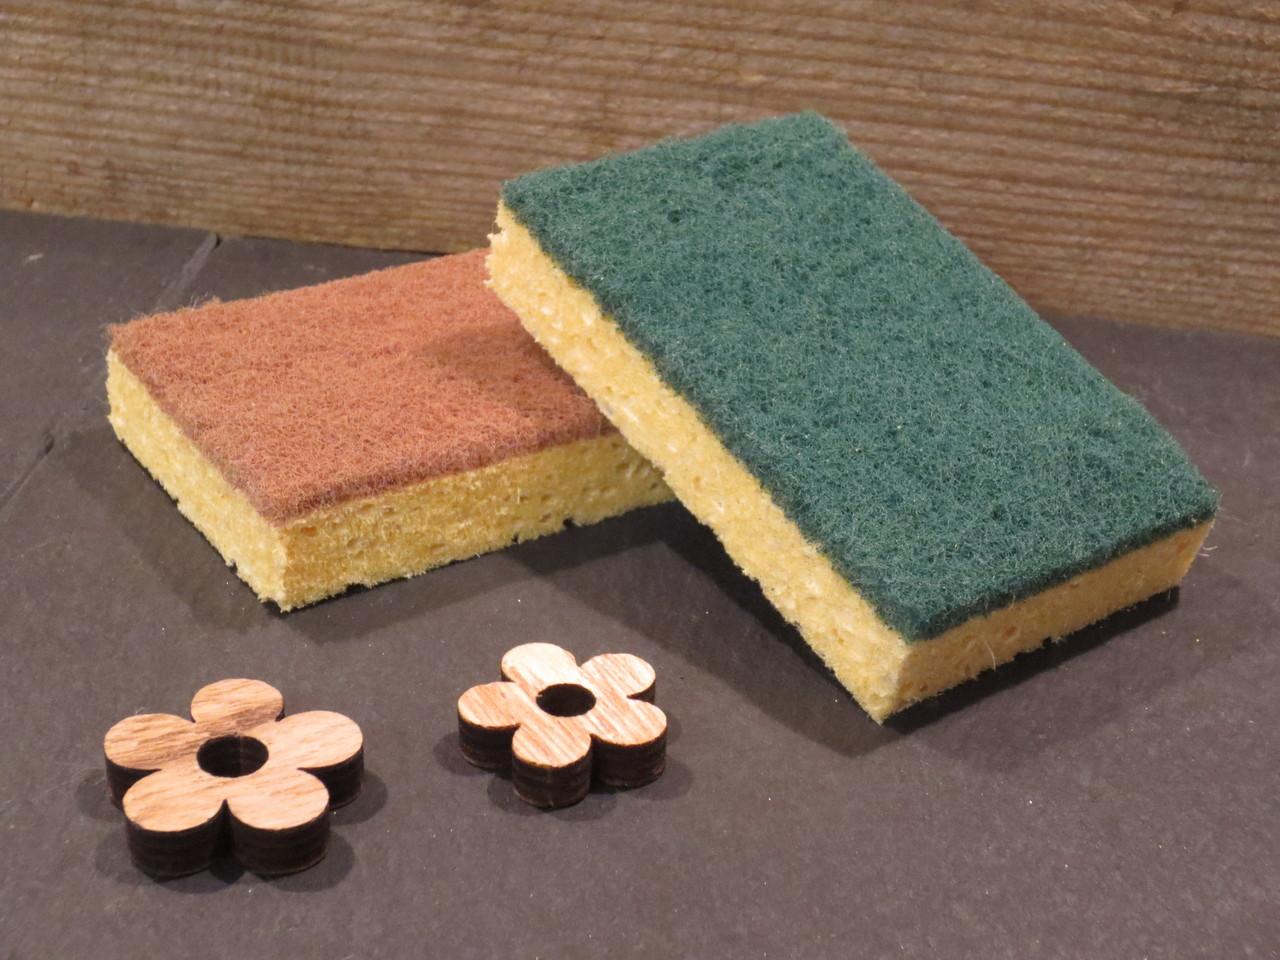 serpilli res ponges grattoirs et lavettes. Black Bedroom Furniture Sets. Home Design Ideas